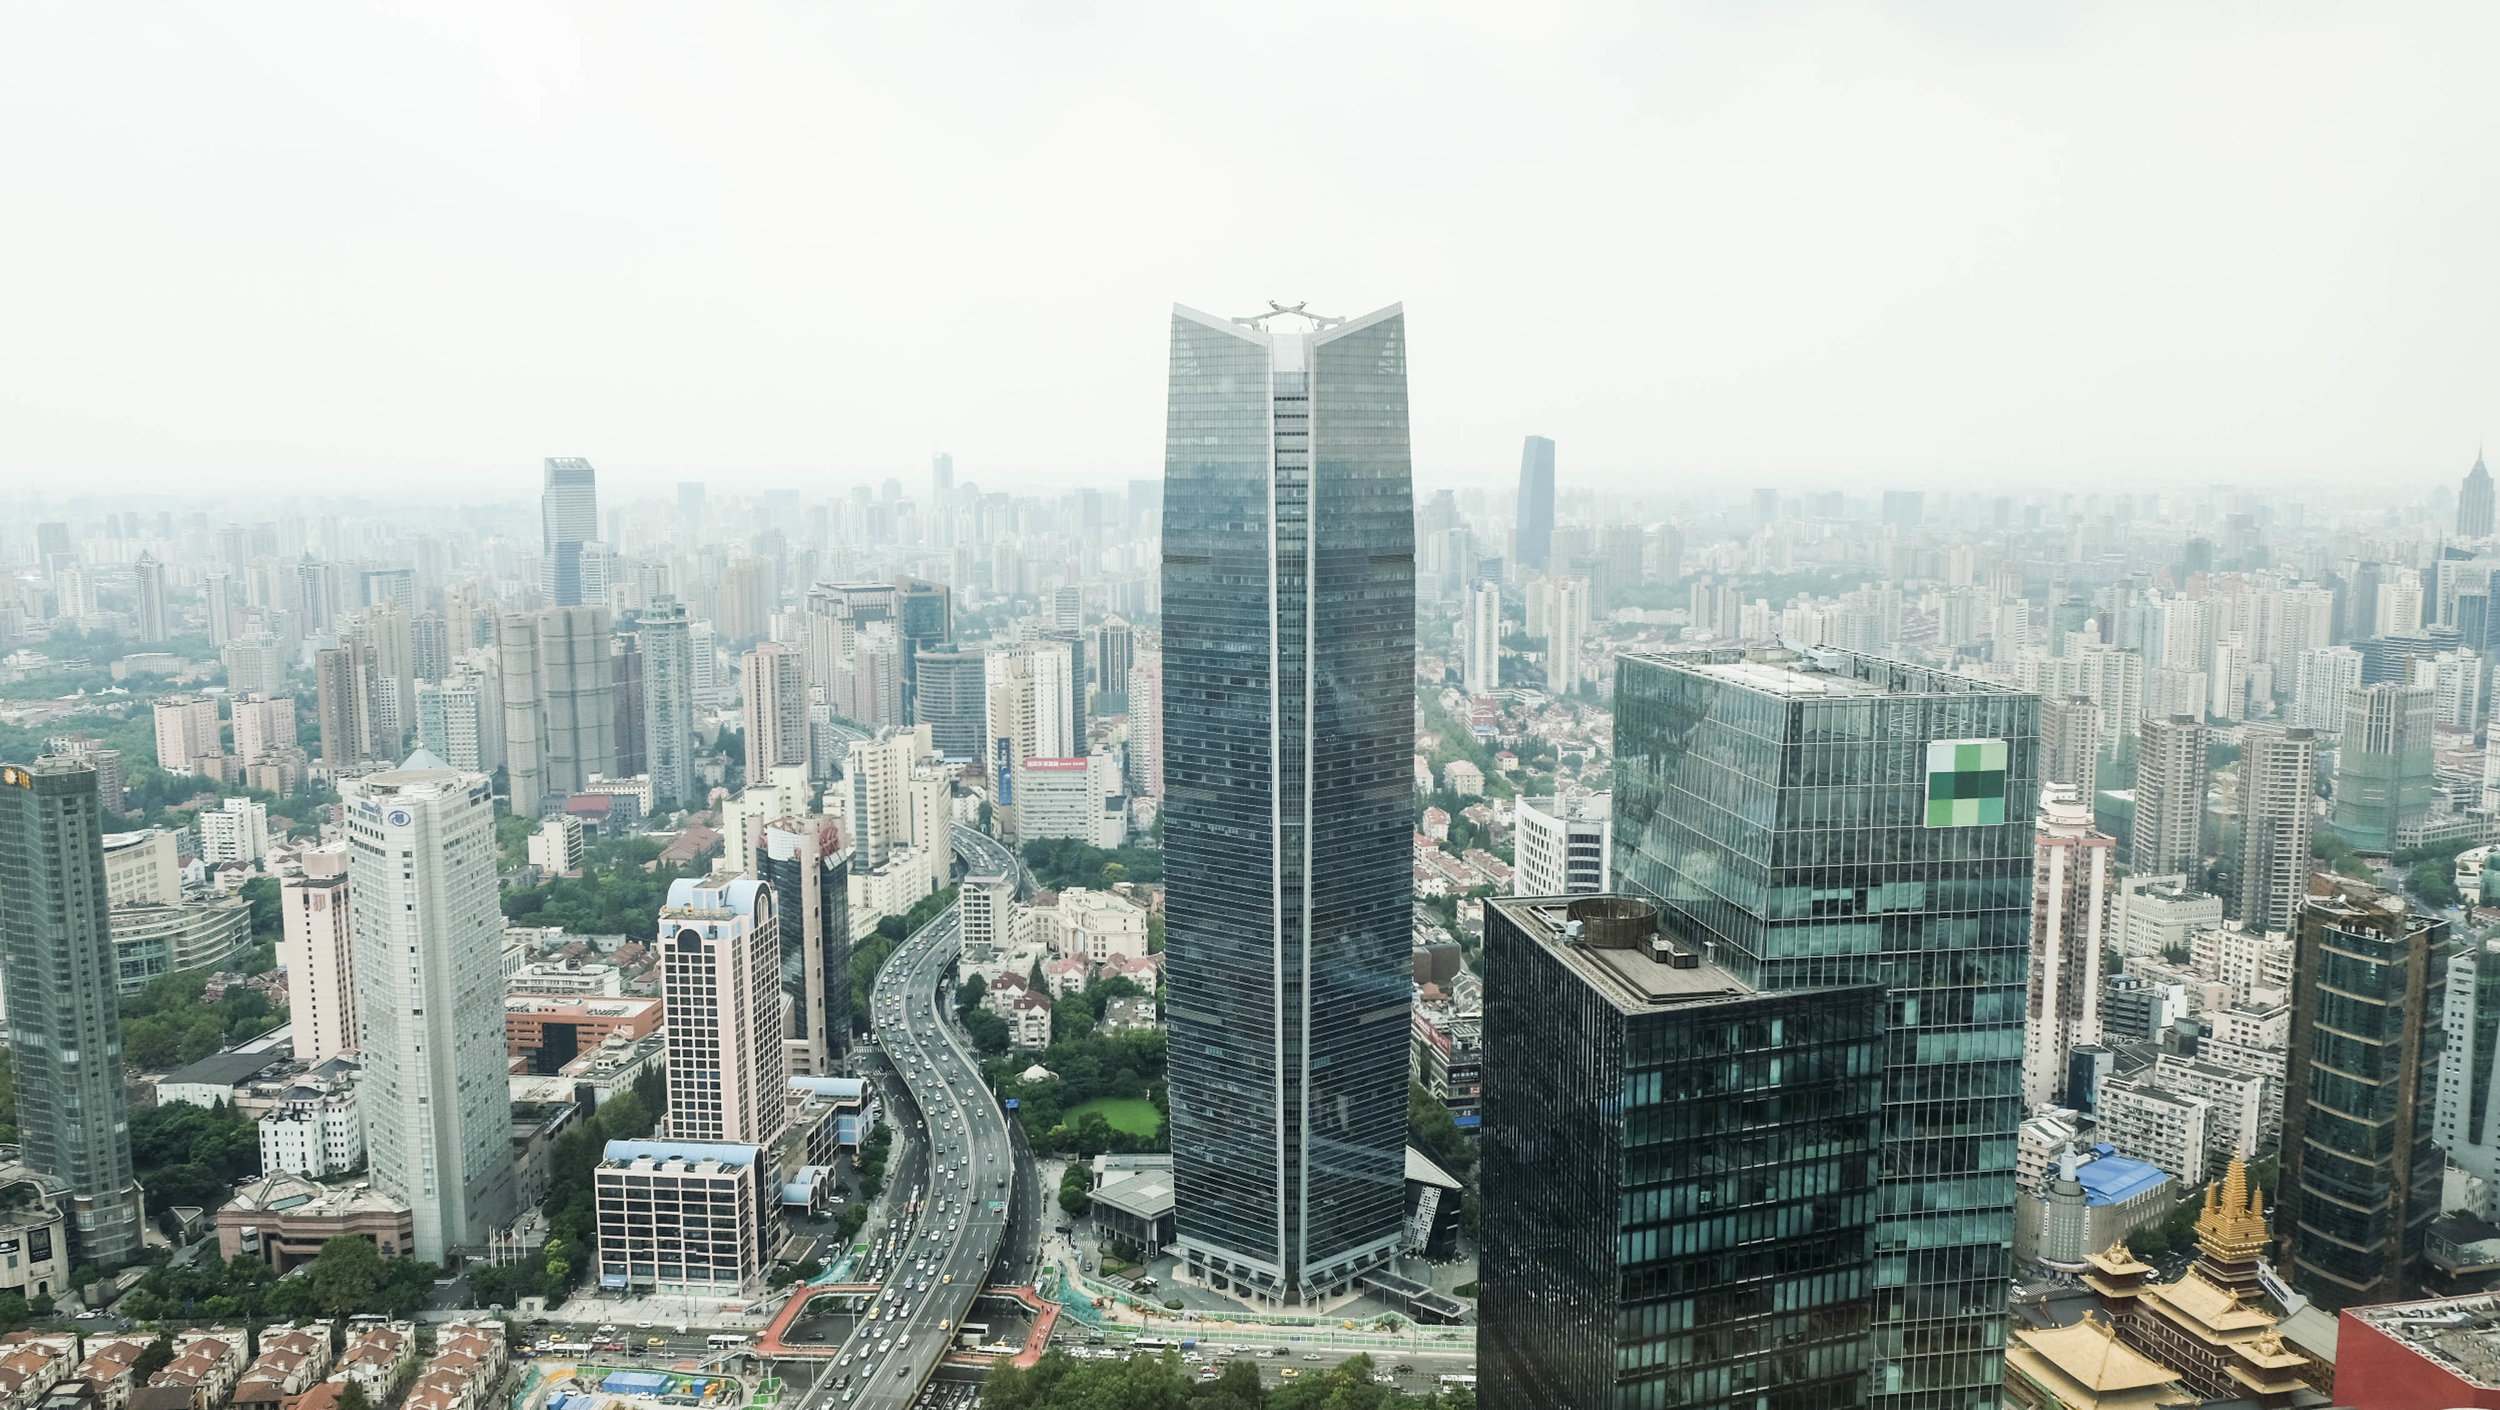 Shanghai's city center.